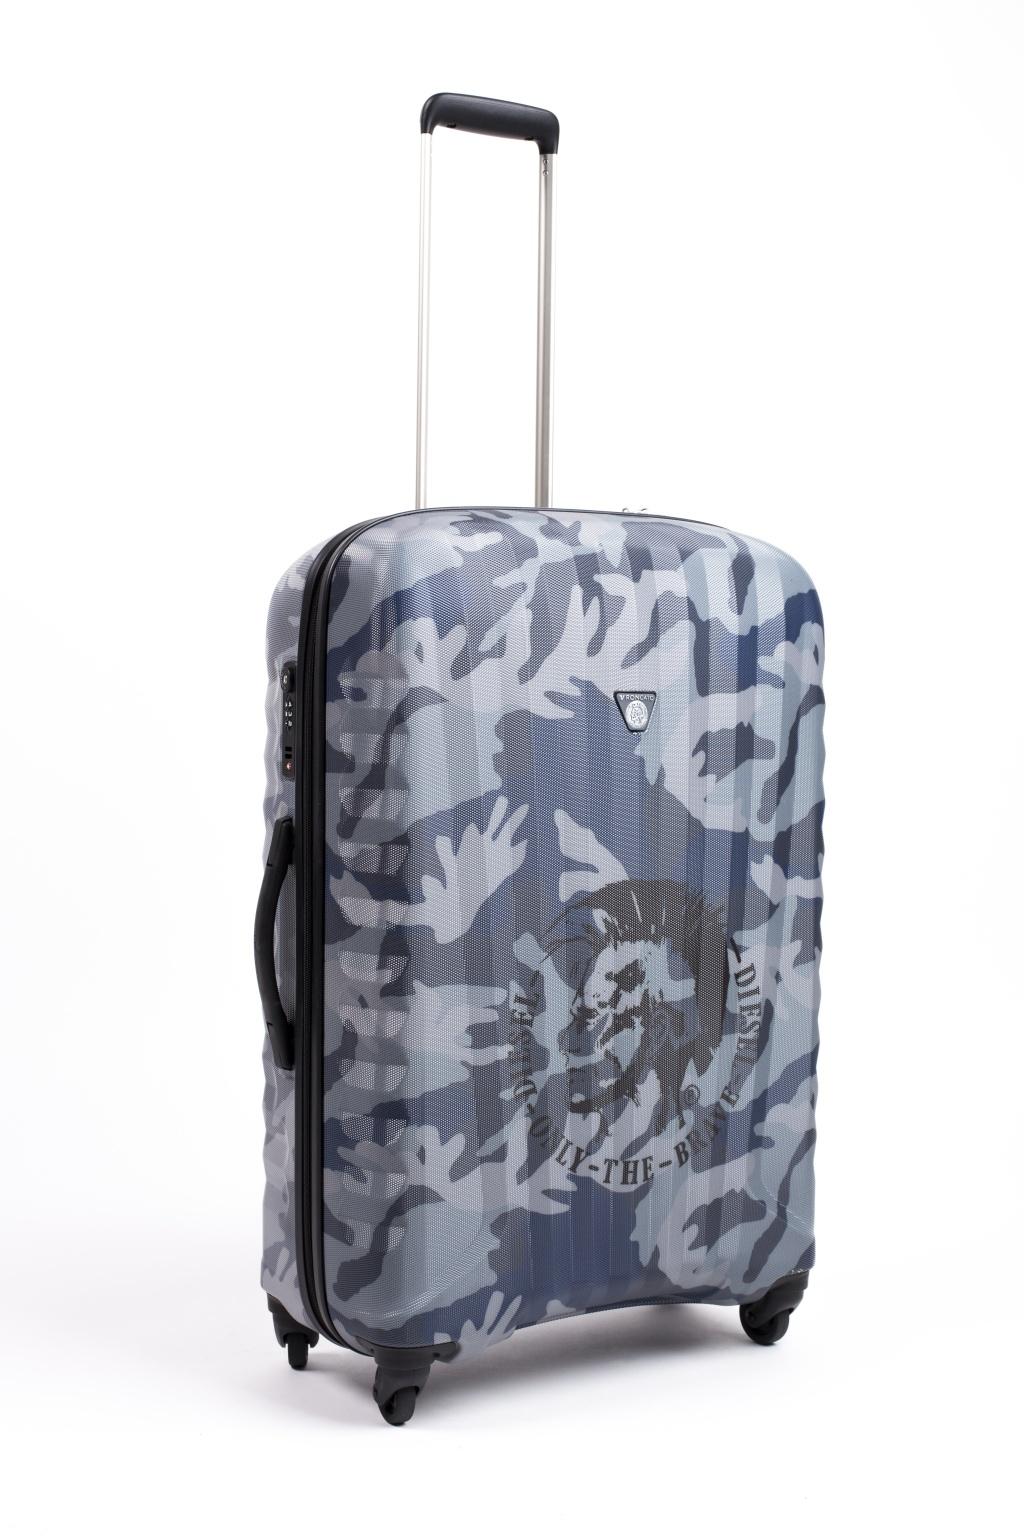 Diesel 'Move M' travel bag